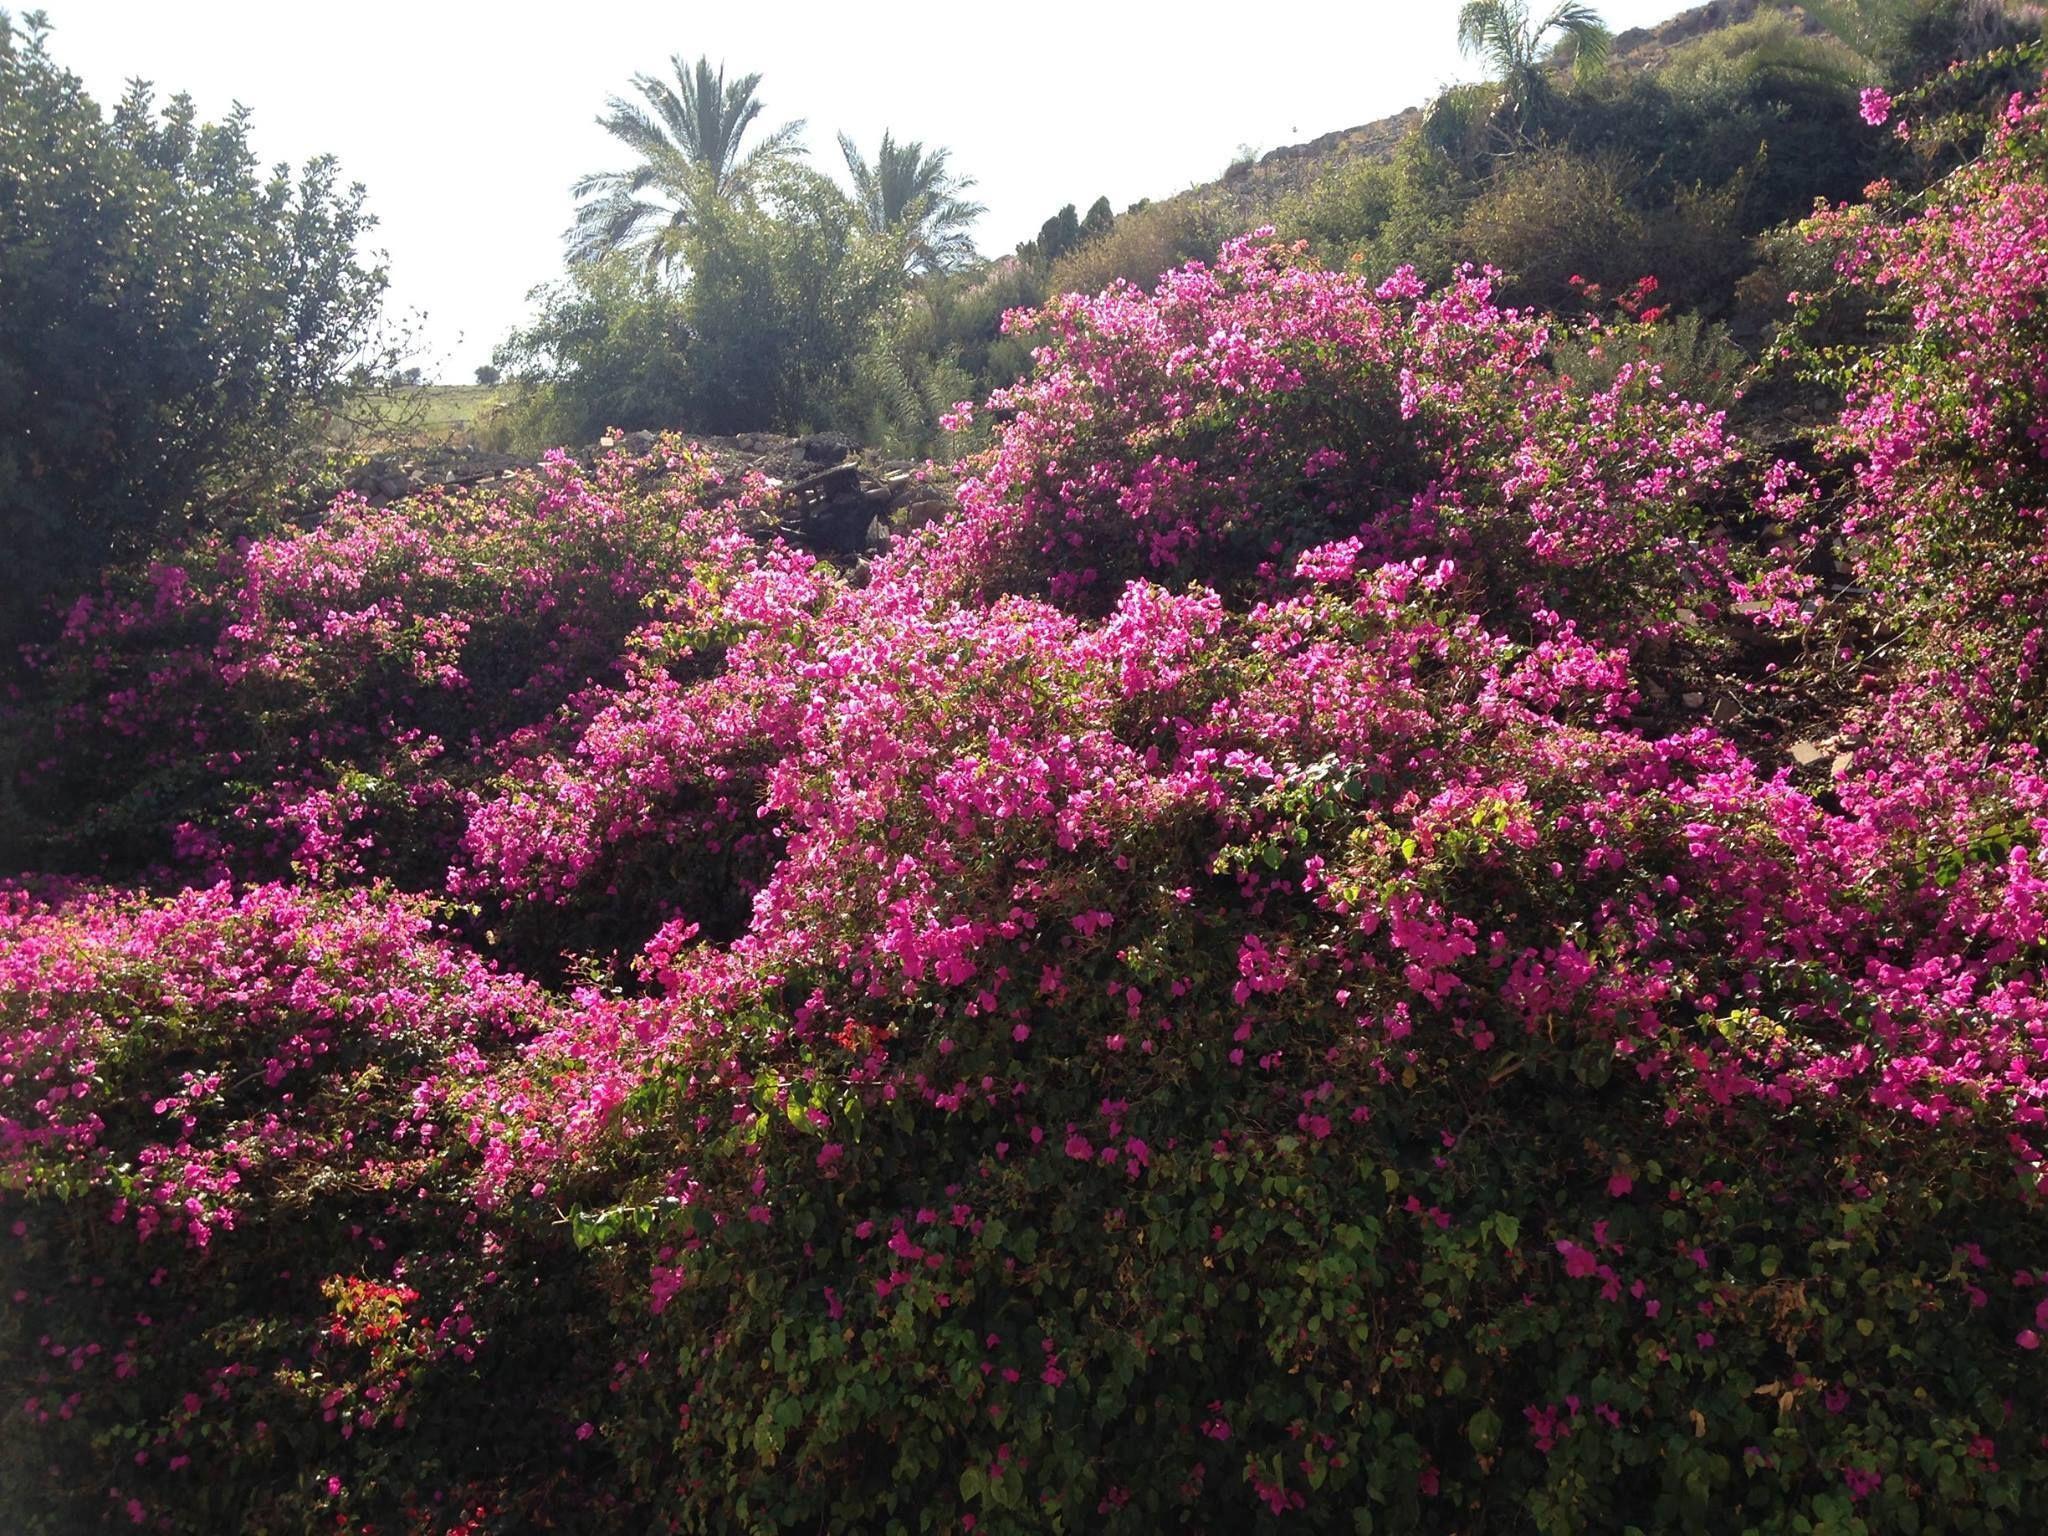 beautiful flowers, near the Sea of Galilee.